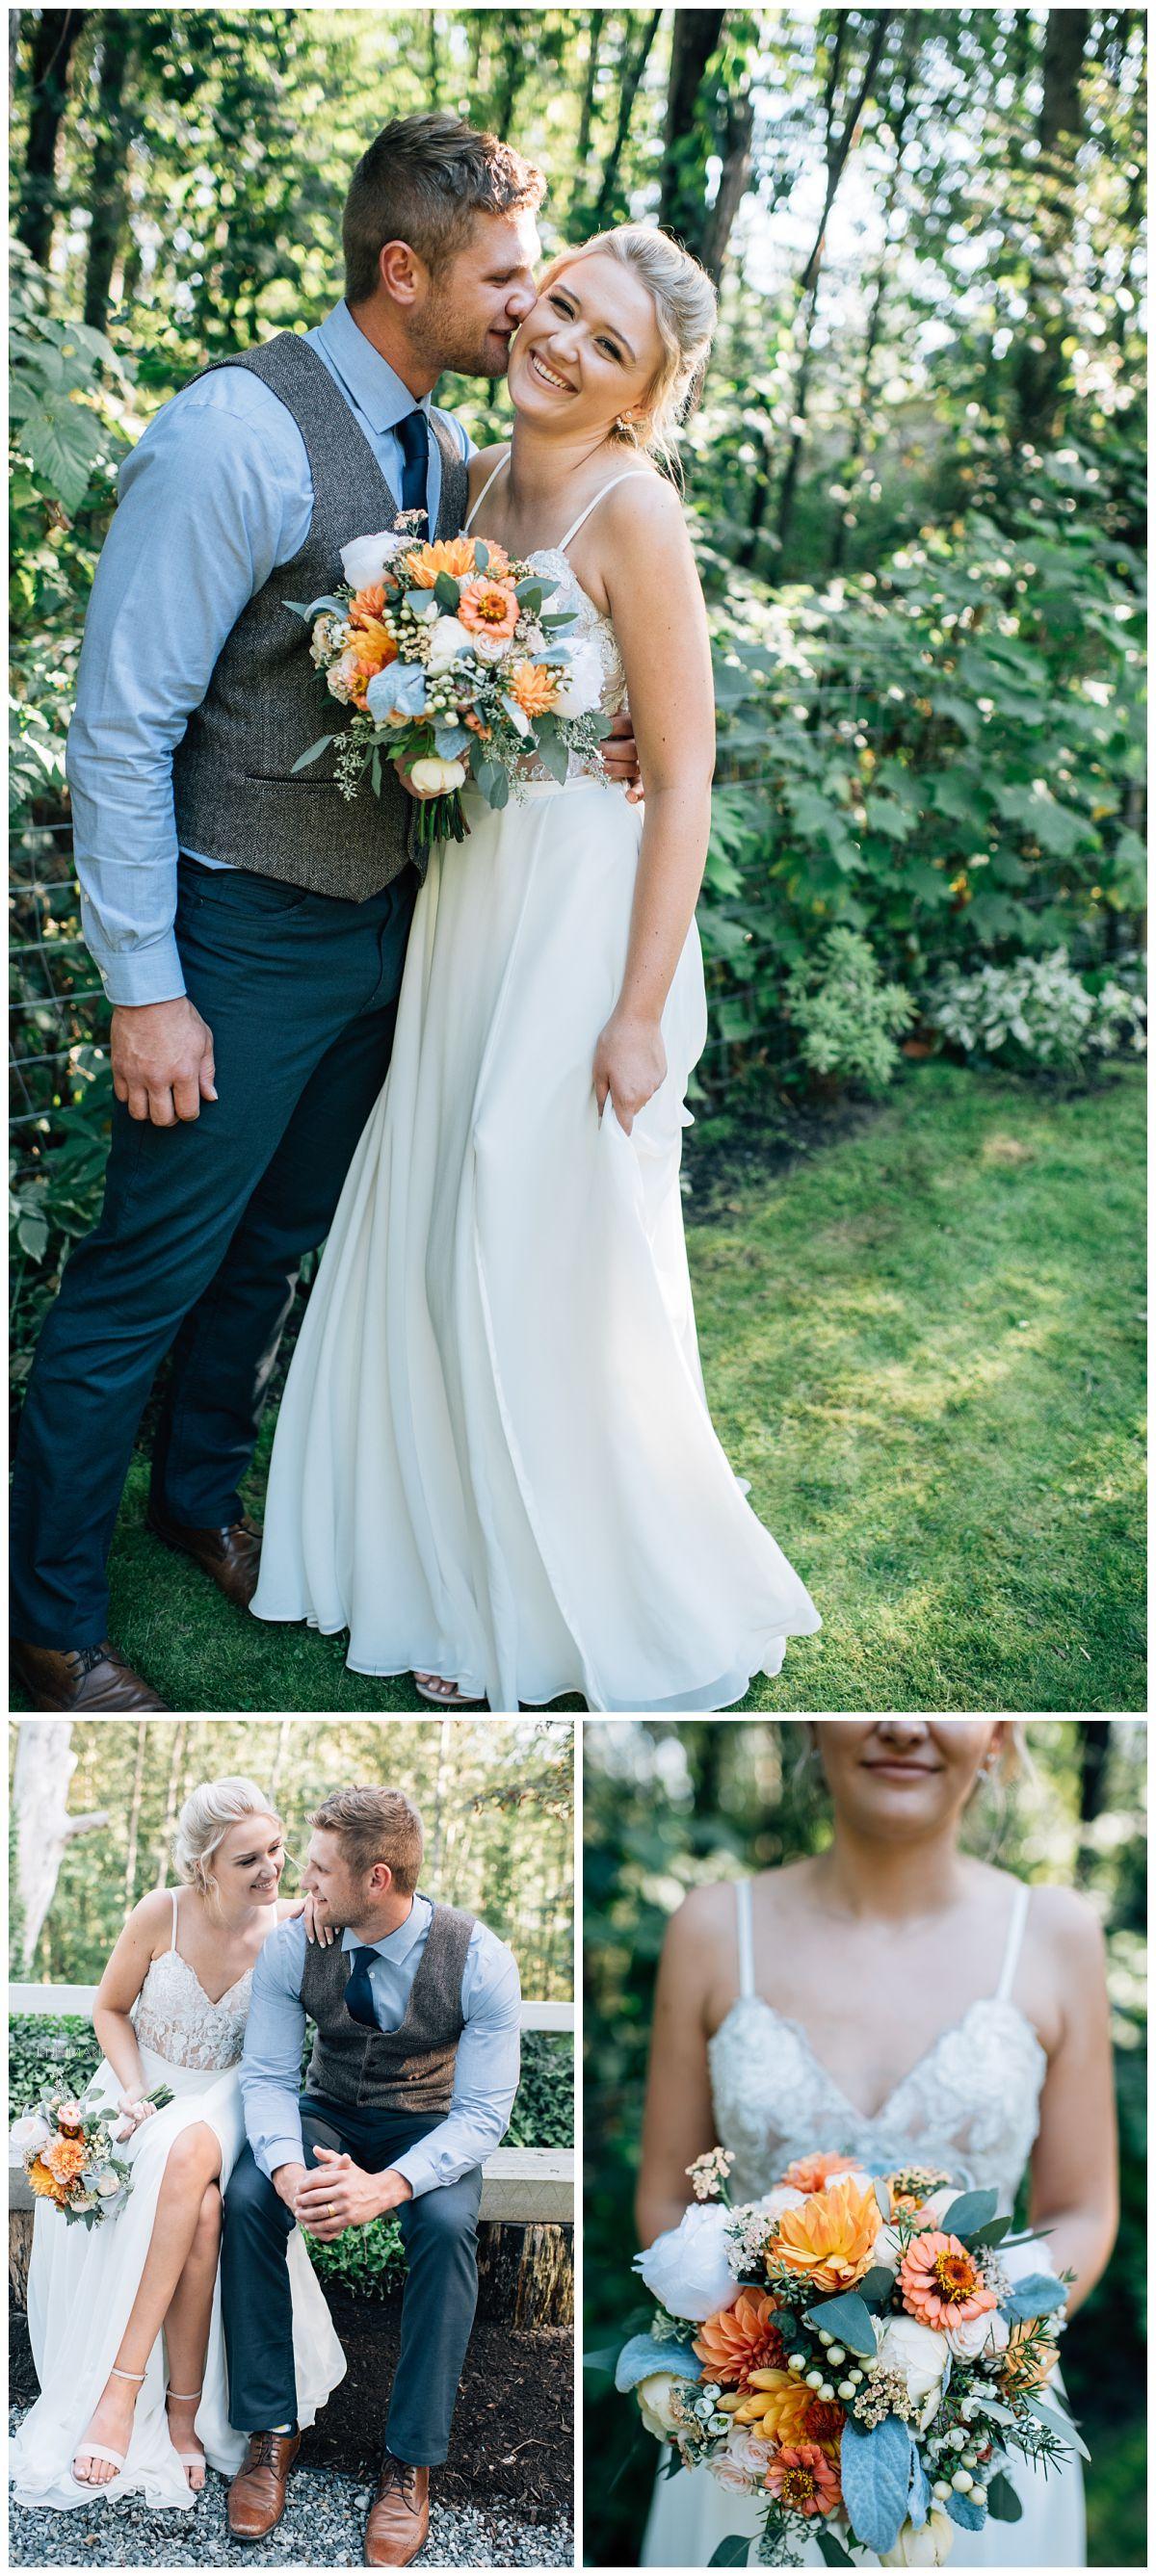 Abbotsford Backyard Wedding with Shing Weddings